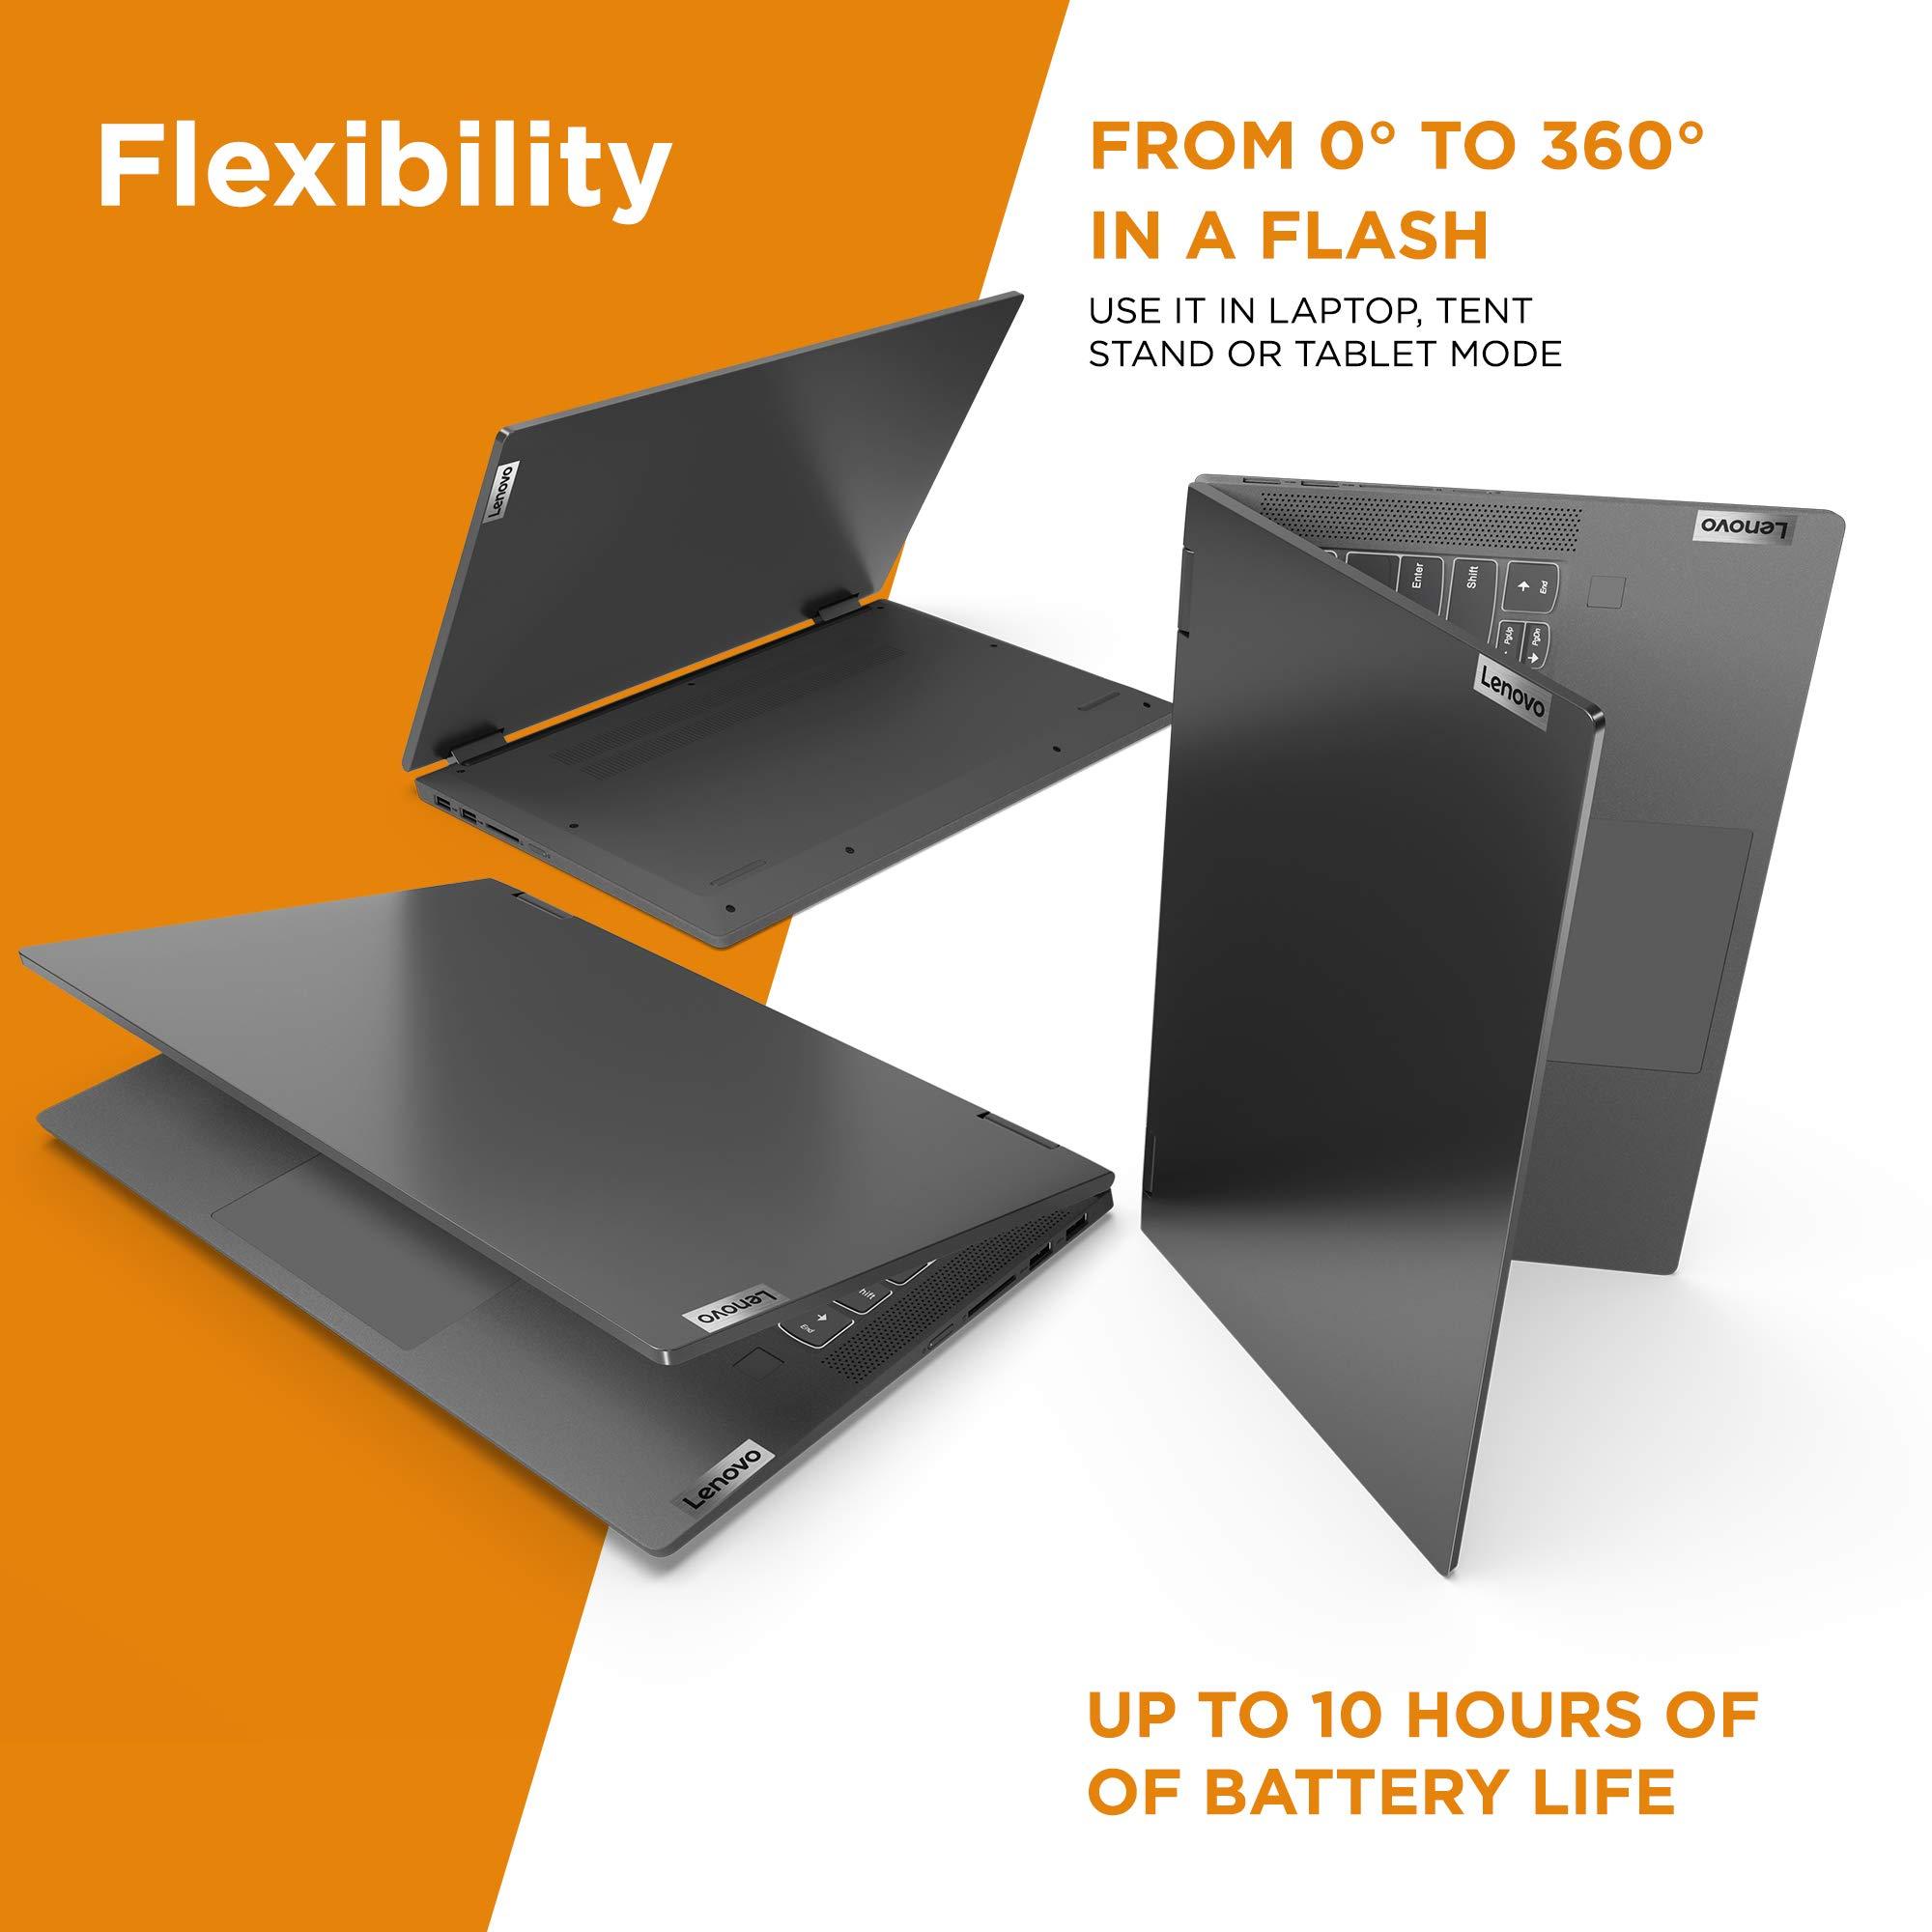 "Lenovo Flex 5 14"" 2-in-1 Laptop, 14.0"" FHD (1920 x 1080) Touch Display, AMD Ryzen 5 4500U Processor, 16GB DDR4, 256GB SSD, AMD Radeon Graphics, Digital Pen Included, Win 10, 81X20005US, Graphite Grey"